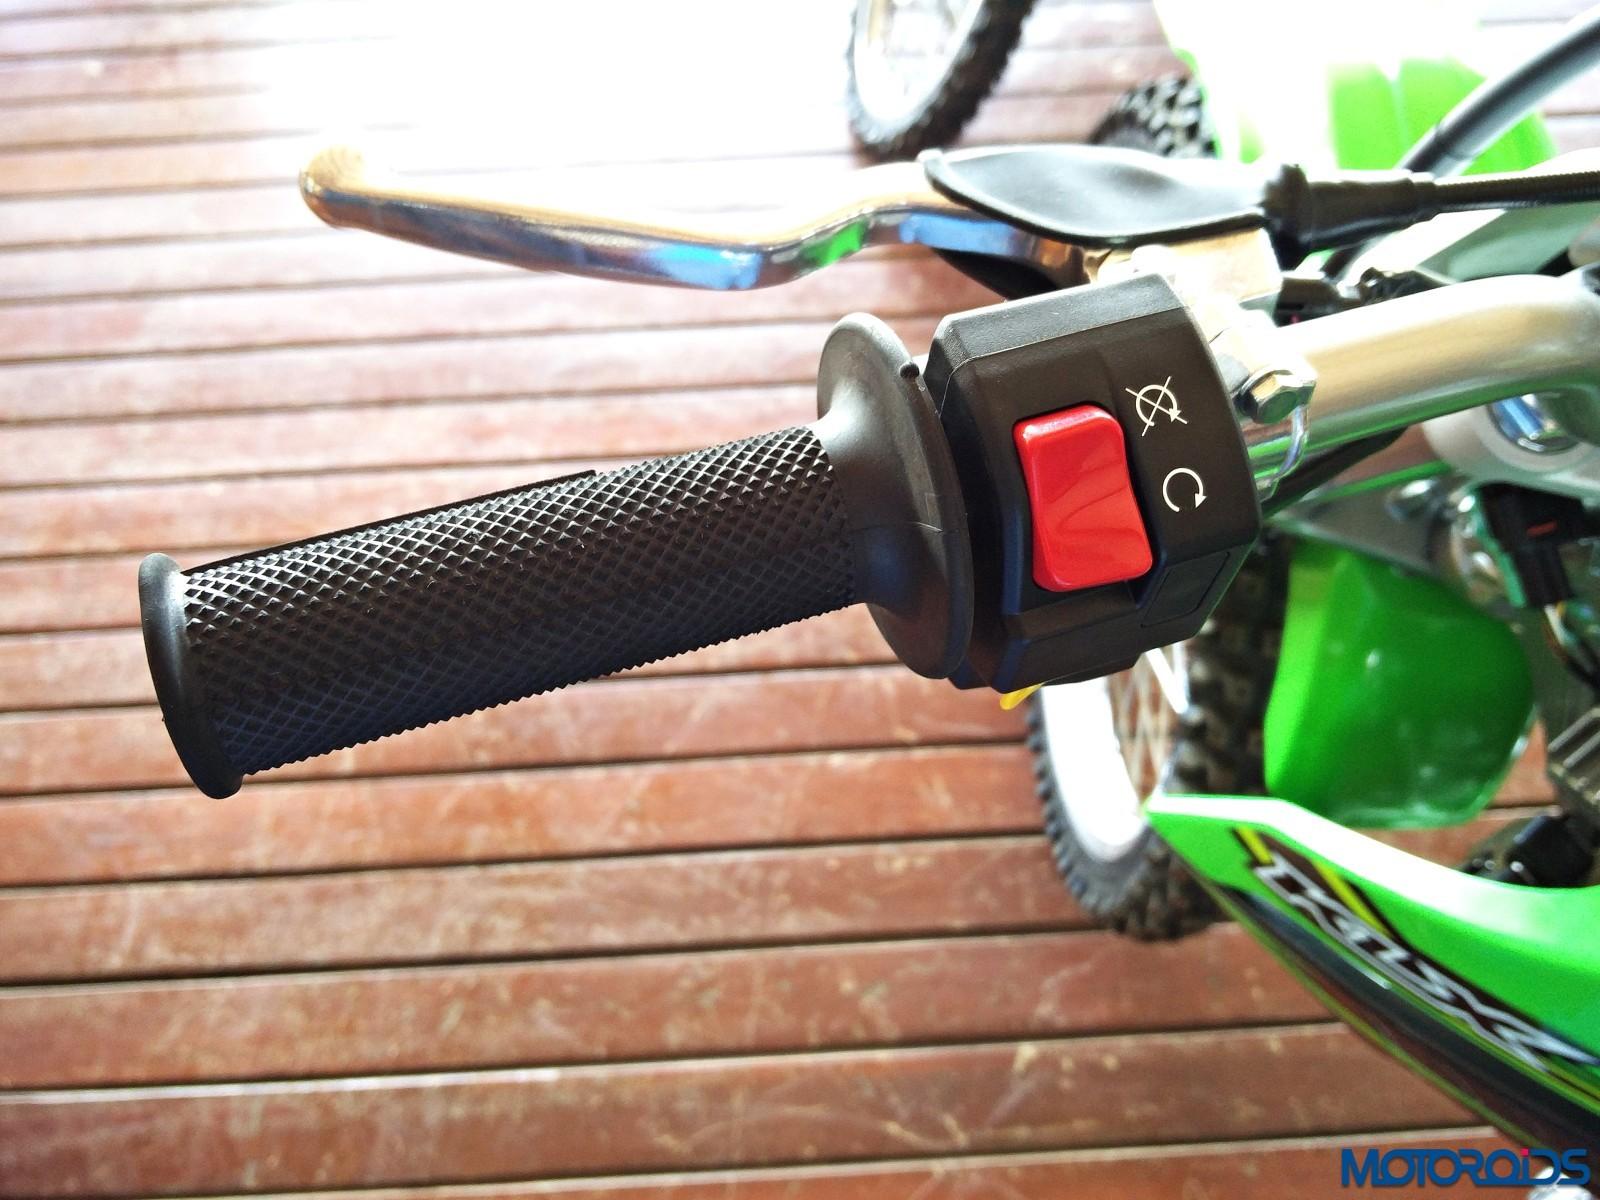 Kawasaki-KLX140G-Ride-Experience-30